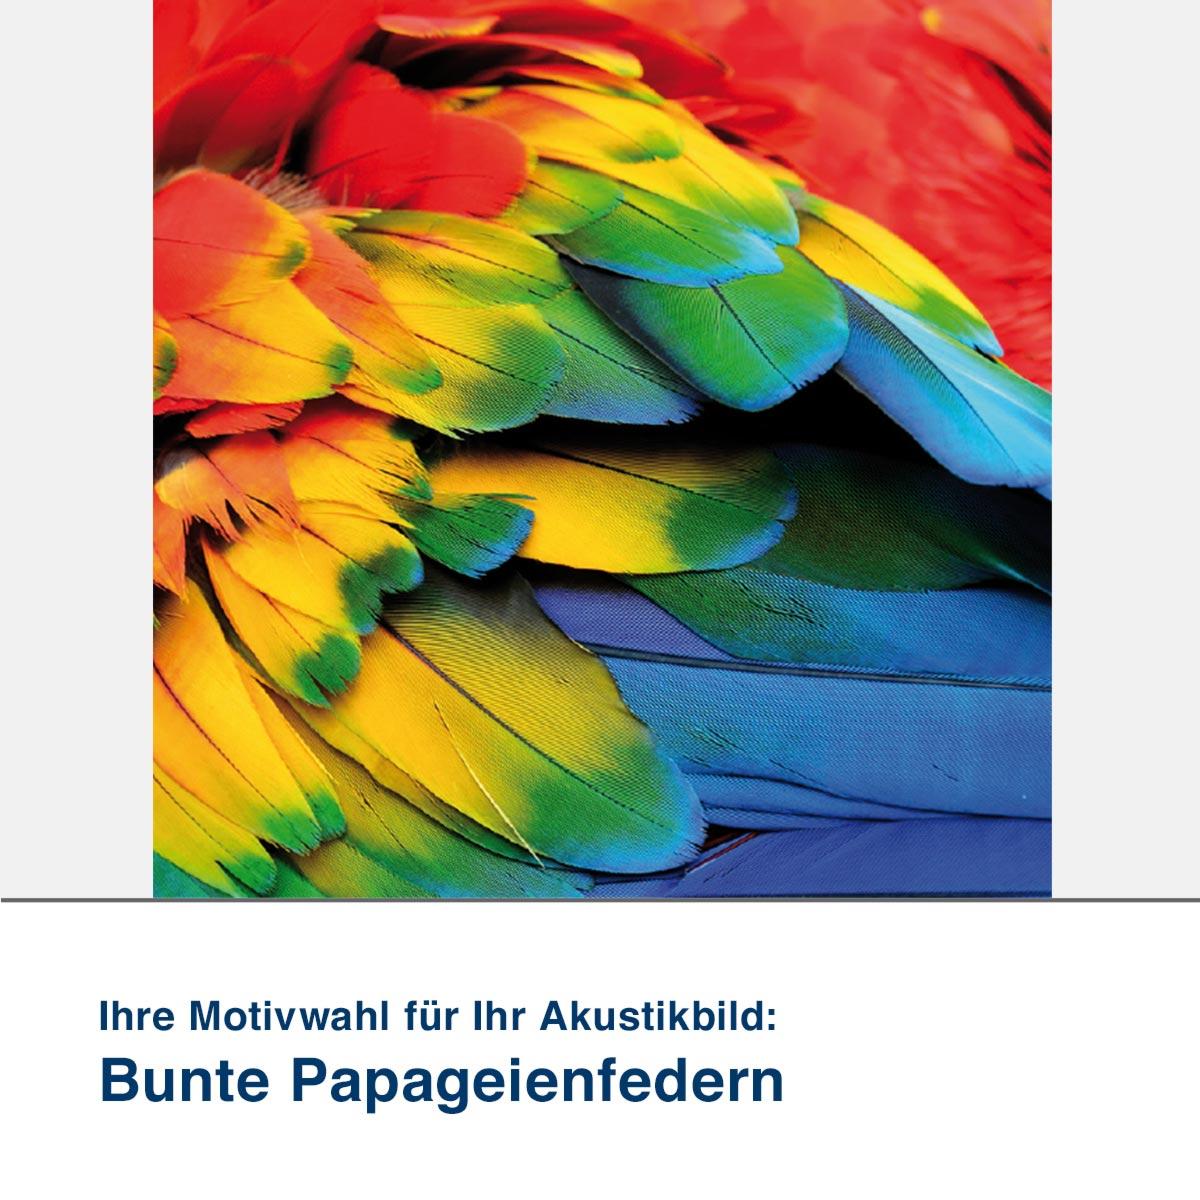 Akustikbild Motiv Bunte Papageienfedern